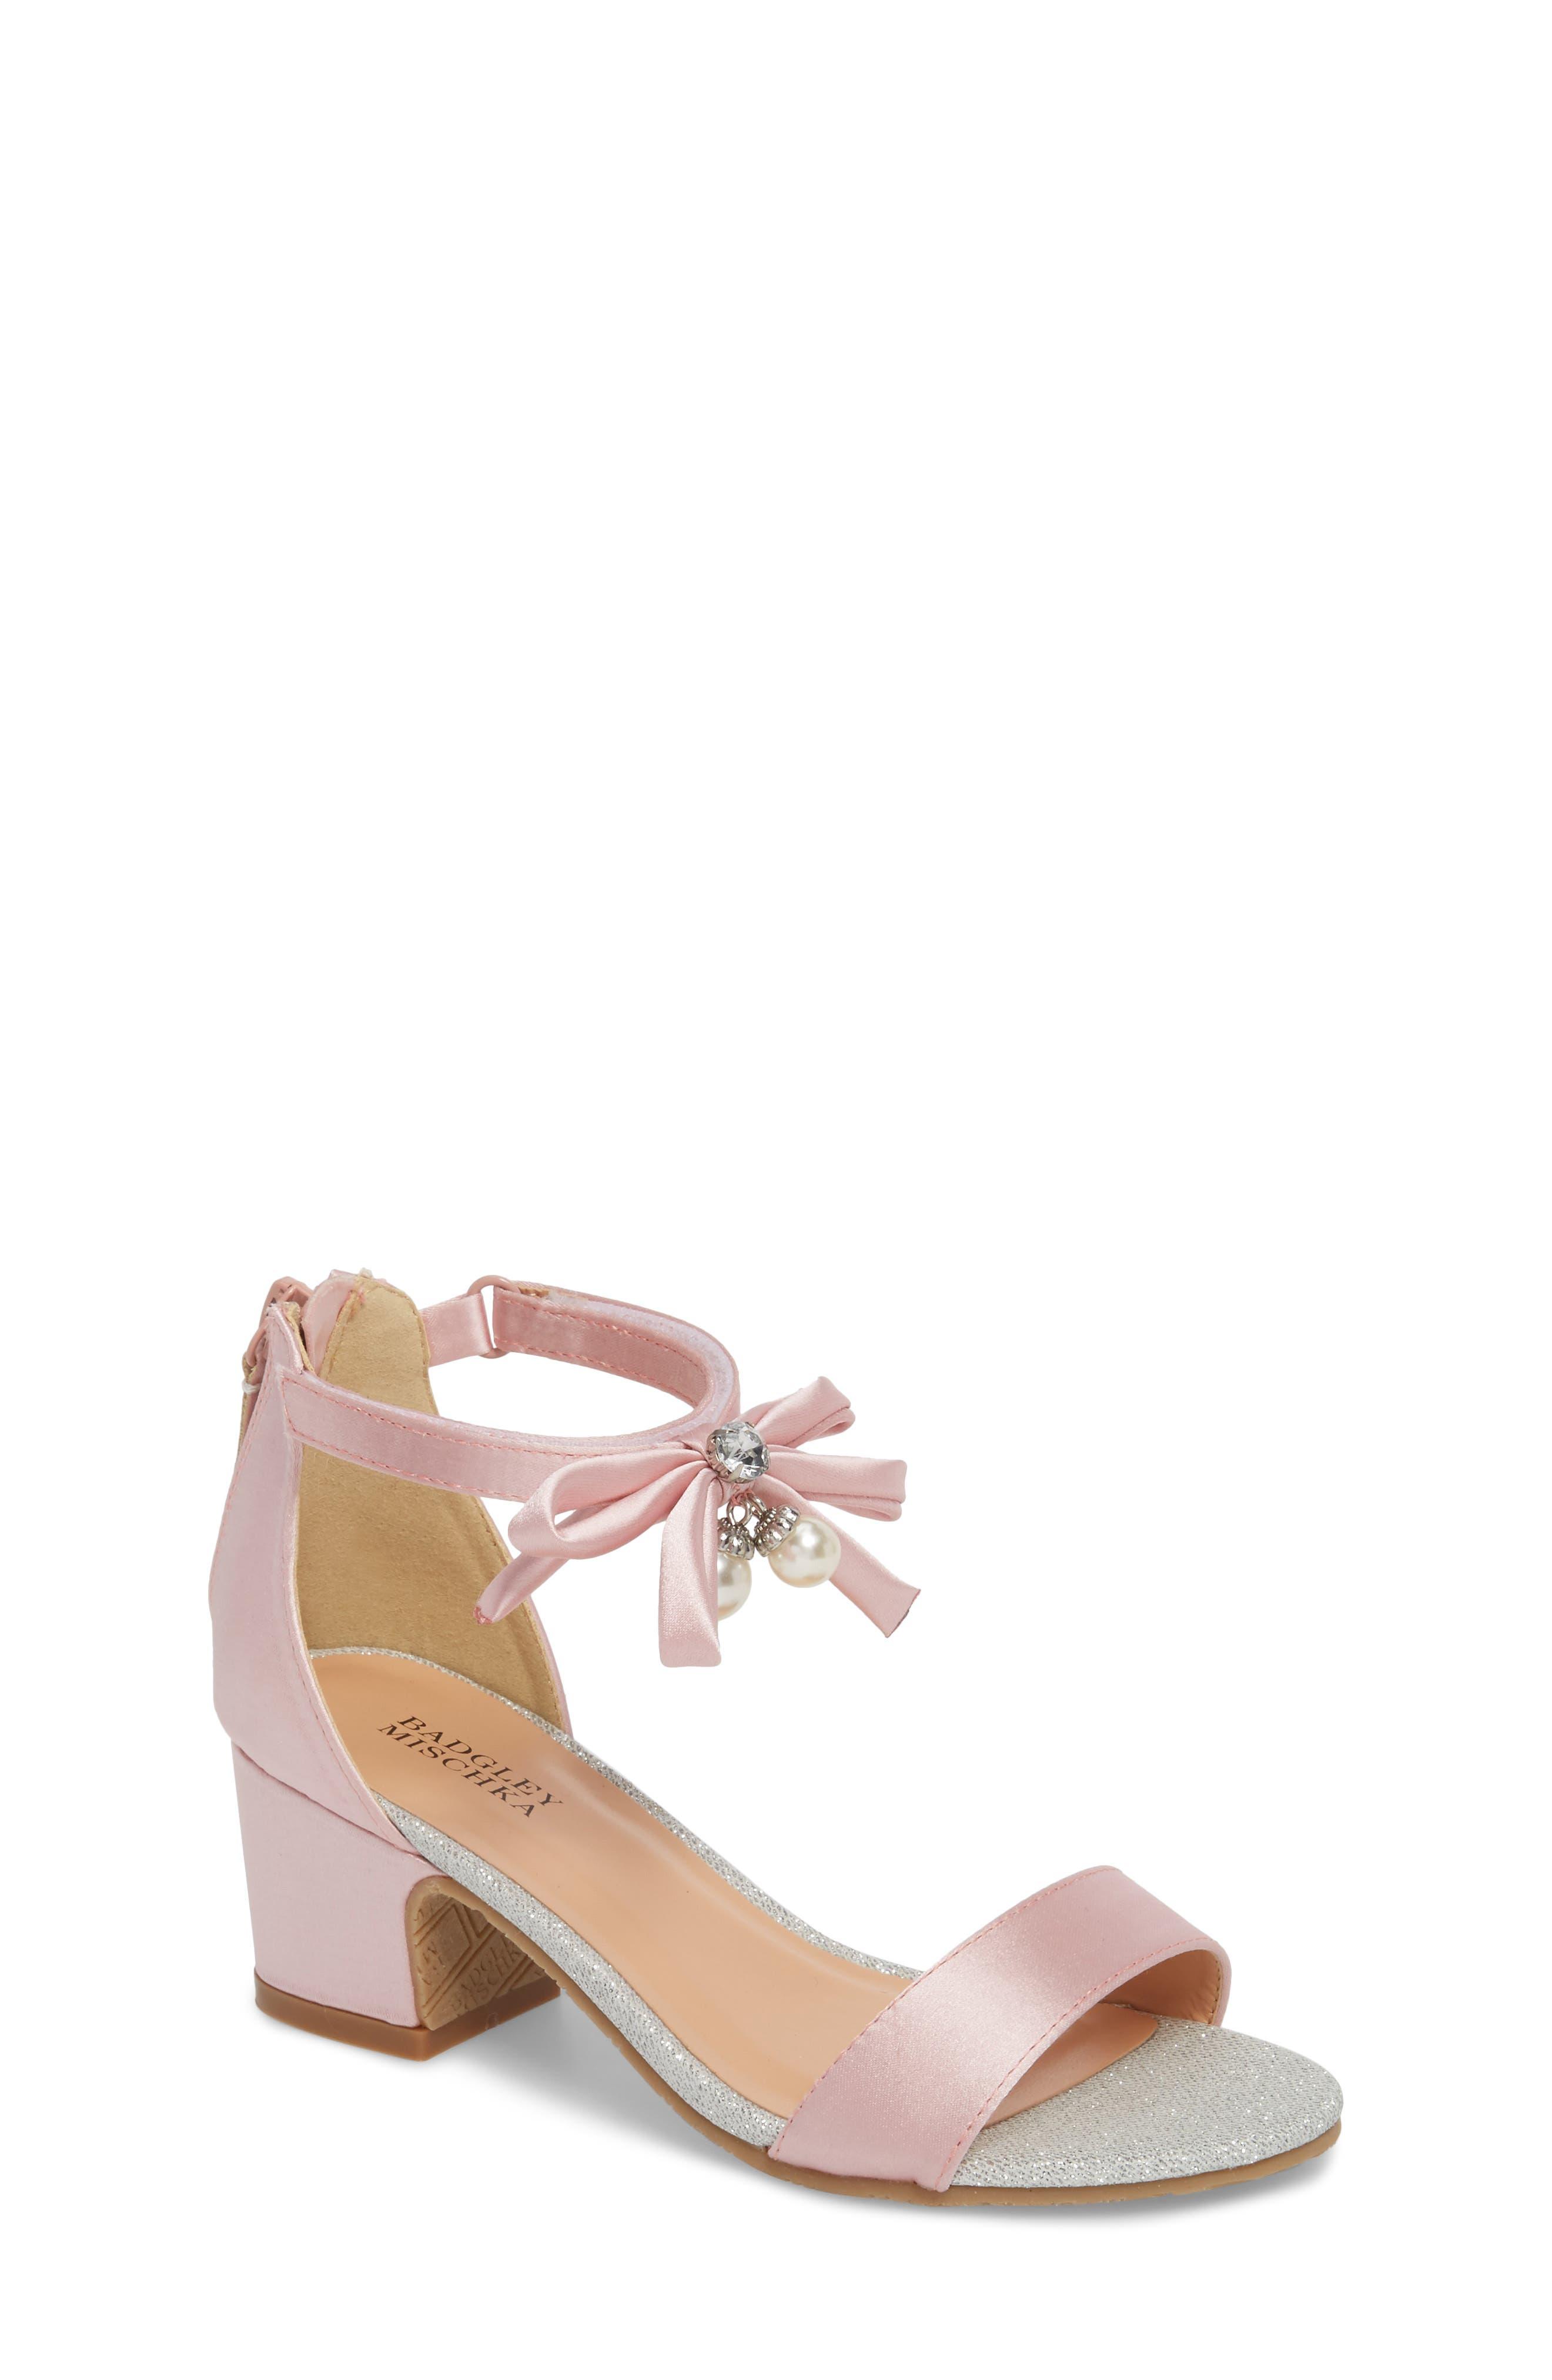 BADGLEY MISCHKA COLLECTION Badgley Mischka Pernia Embellished Sandal, Main, color, PINK/ SILVER